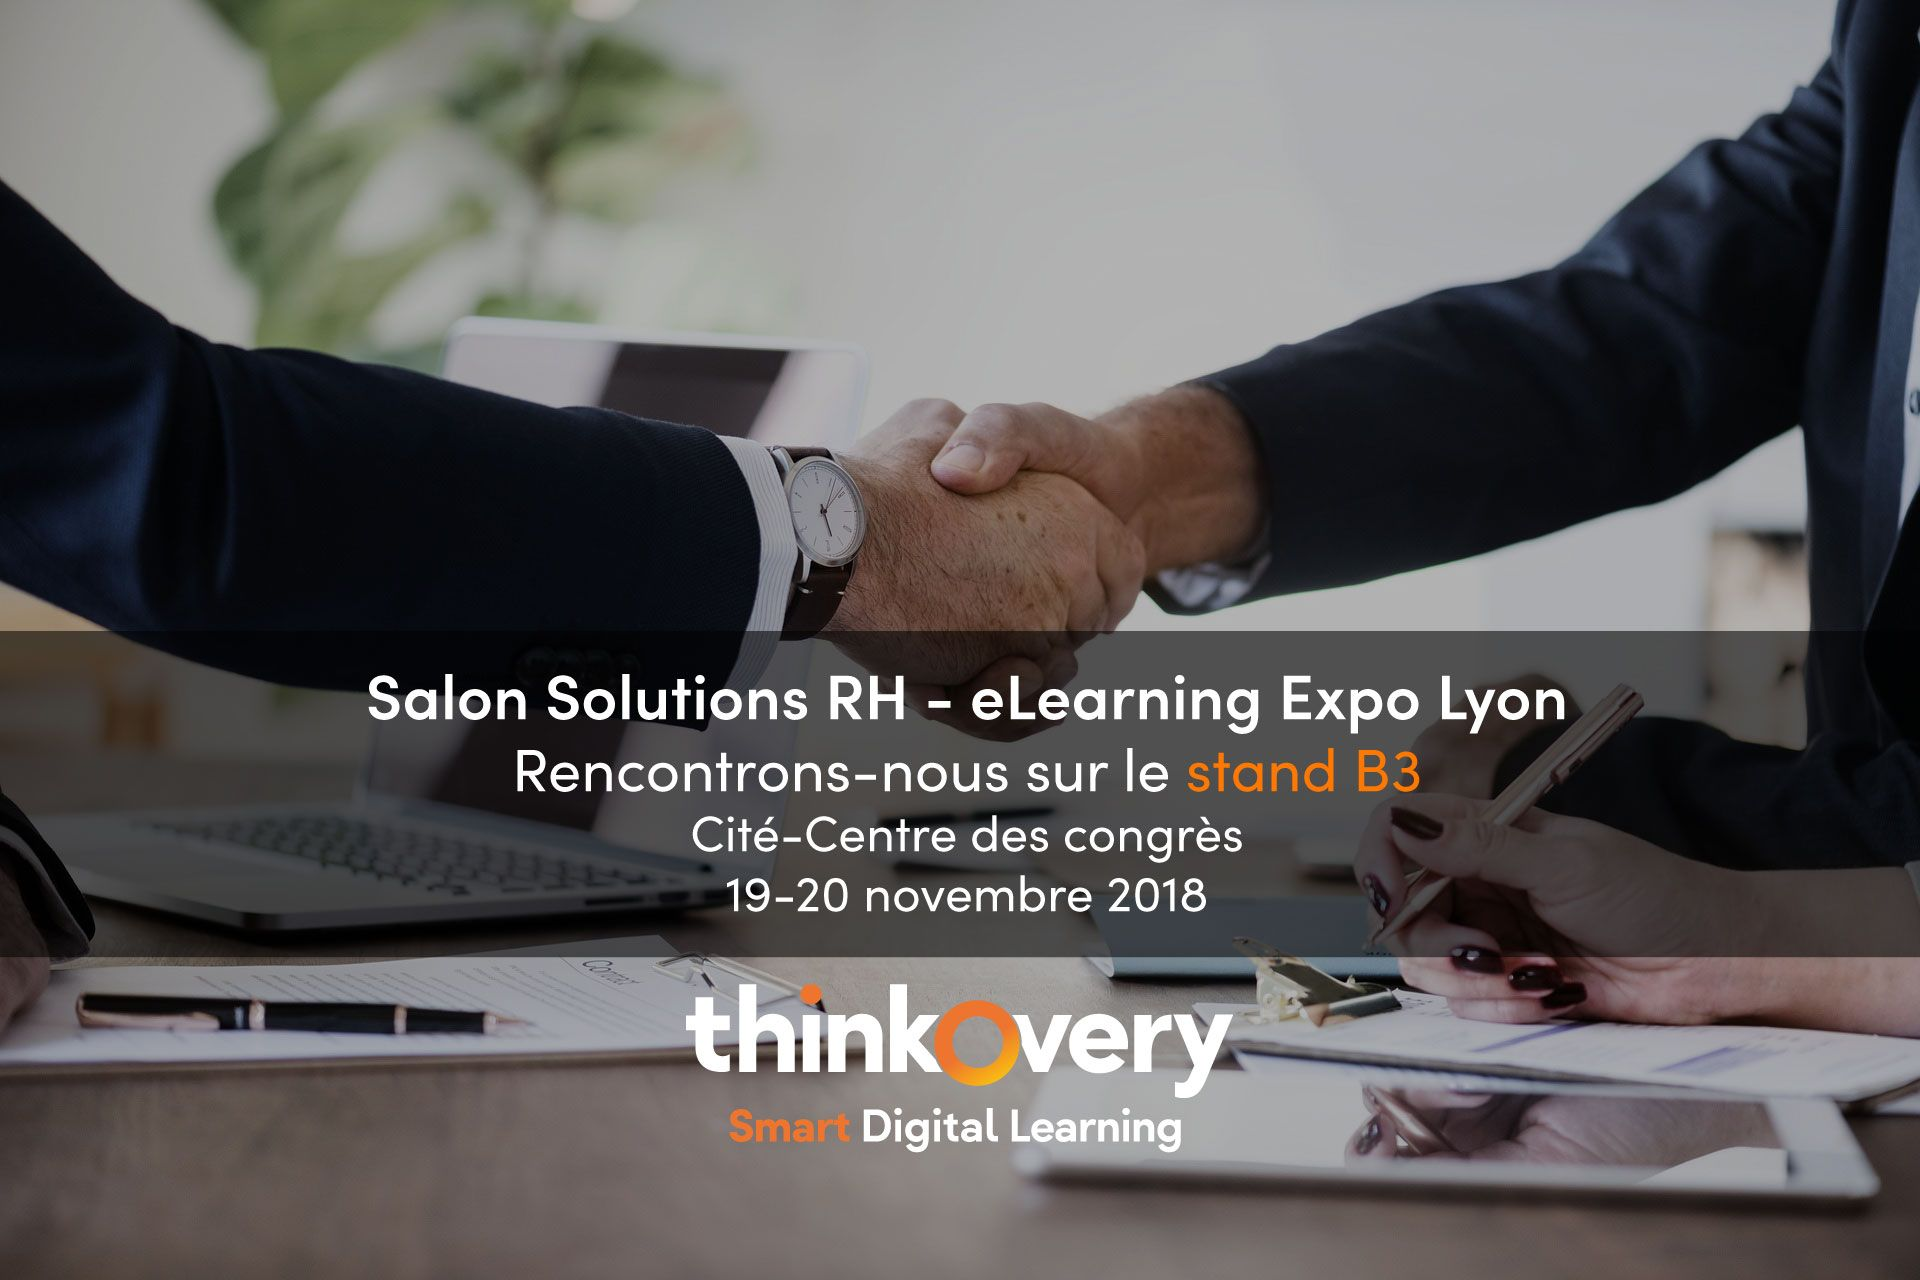 salon srh elearning expo lyon 2018 thinkovery digital learning